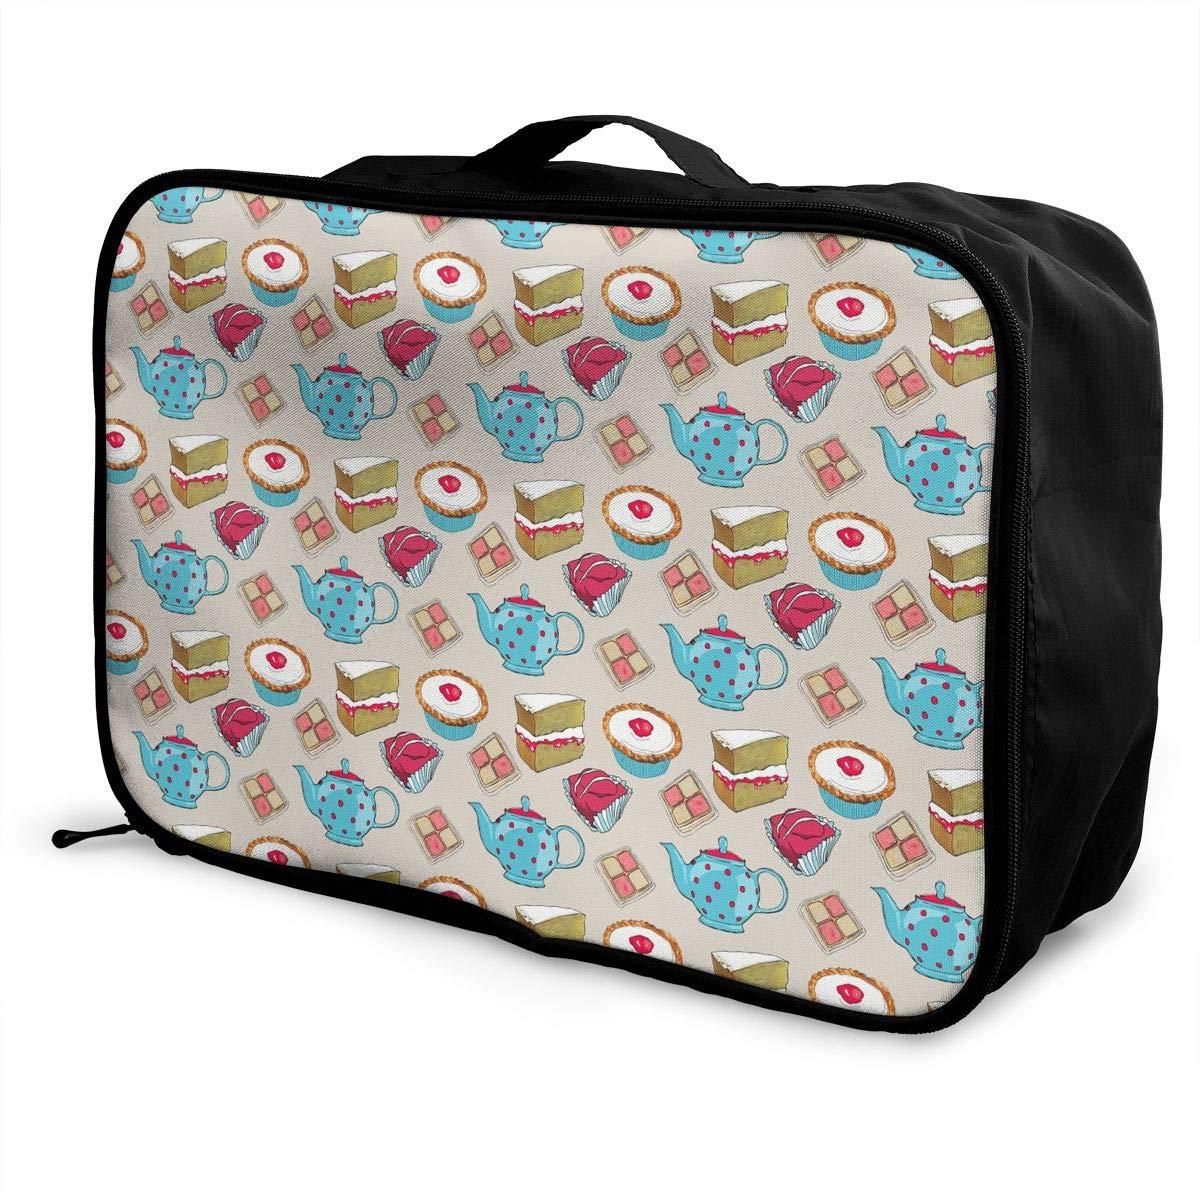 Travel Luggage Duffle Bag Lightweight Portable Handbag Cake Teacup Pattern Large Capacity Waterproof Foldable Storage Tote